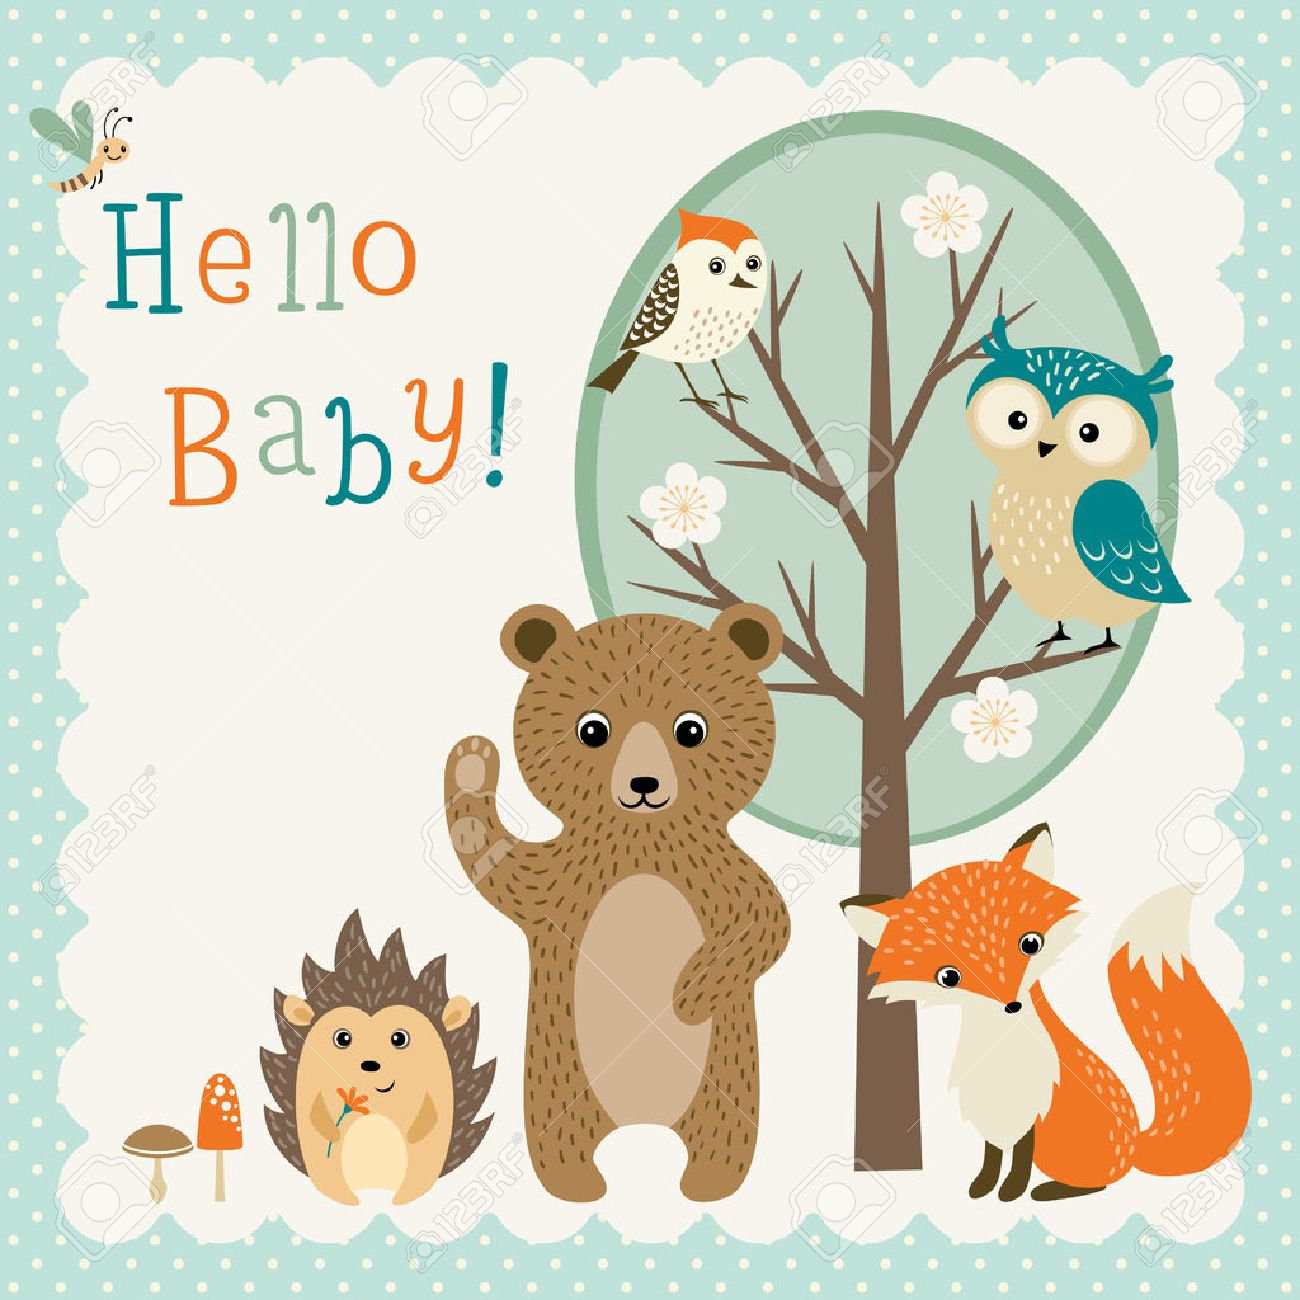 Baby Shower Design With Cute Woodland Animals.